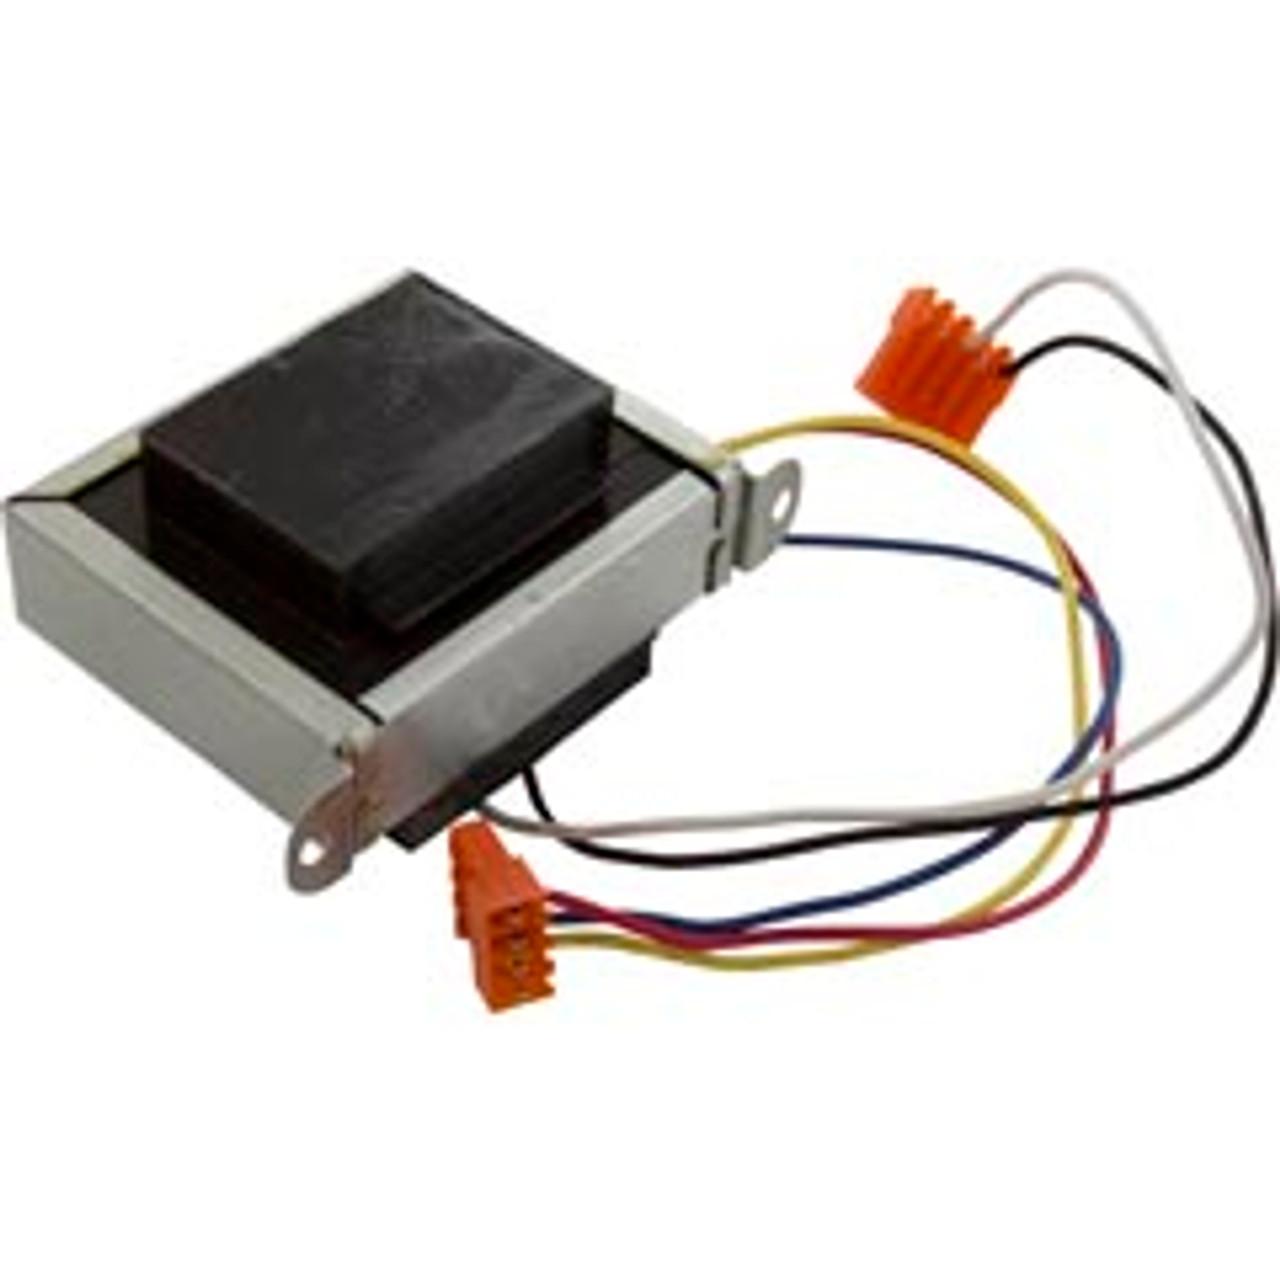 Transformer, Gecko M-Cl-MP, 120v/24v on